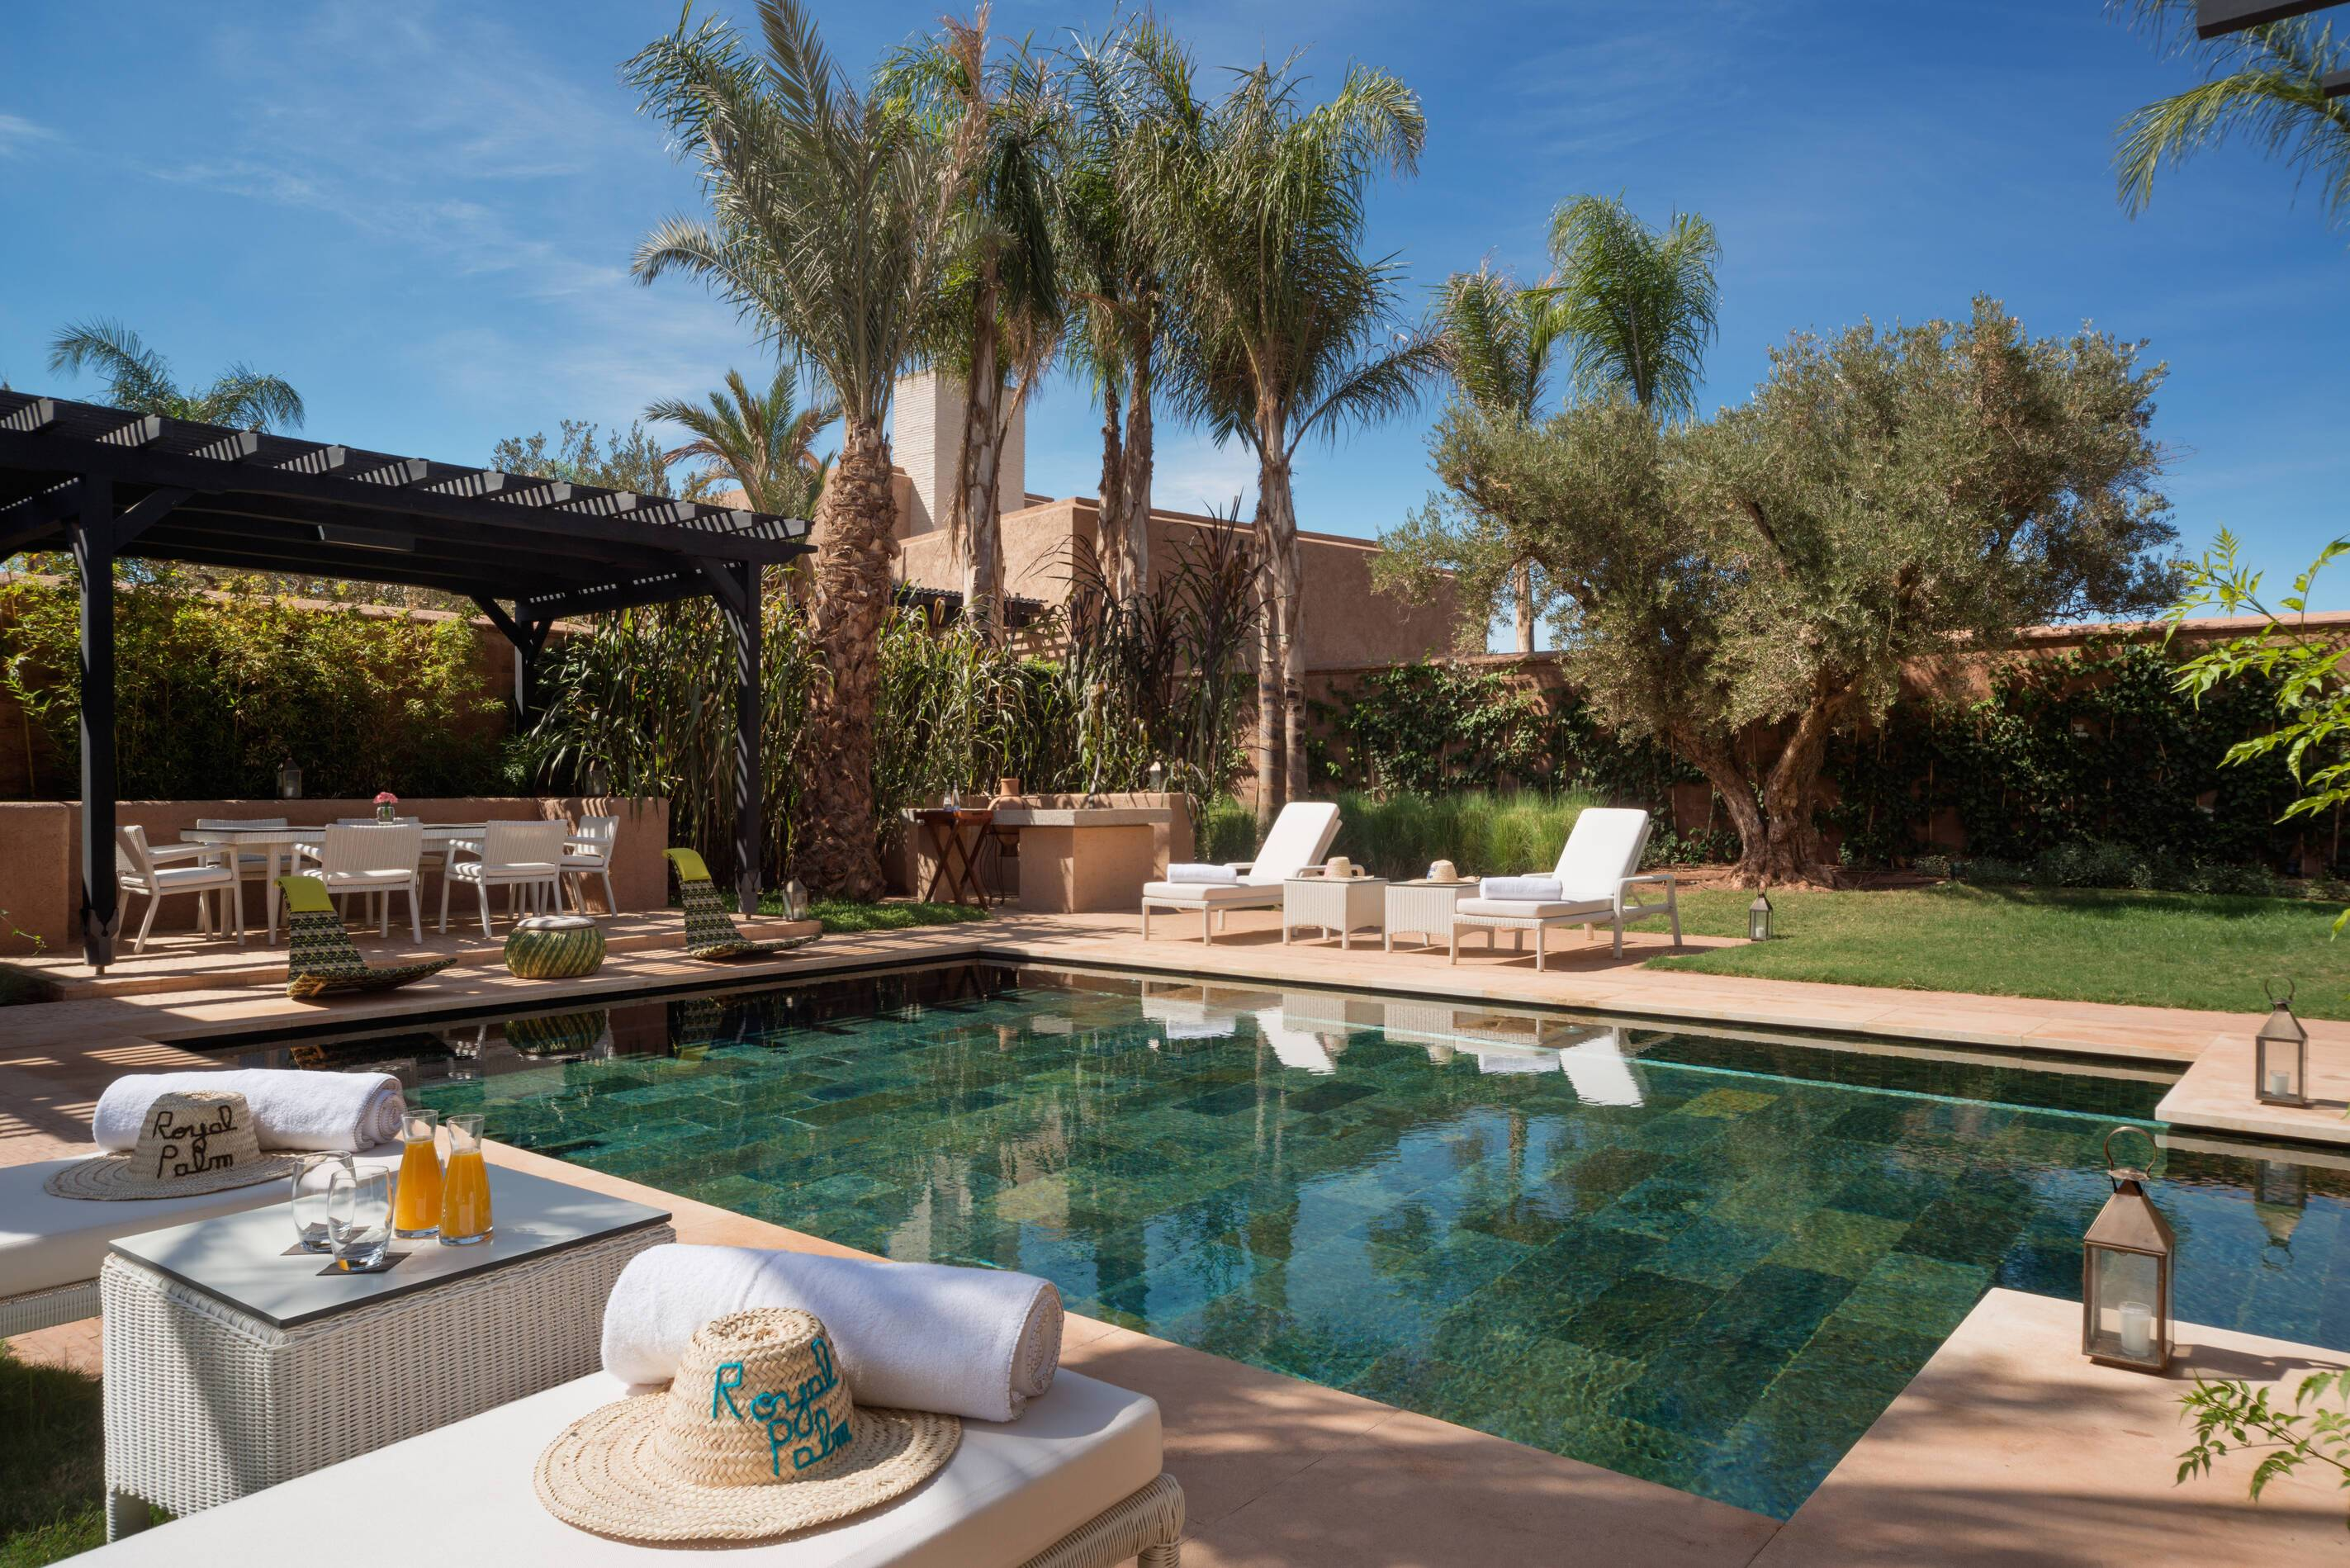 Fairmont Royal Palm Prince Villa Piscine Marrakech